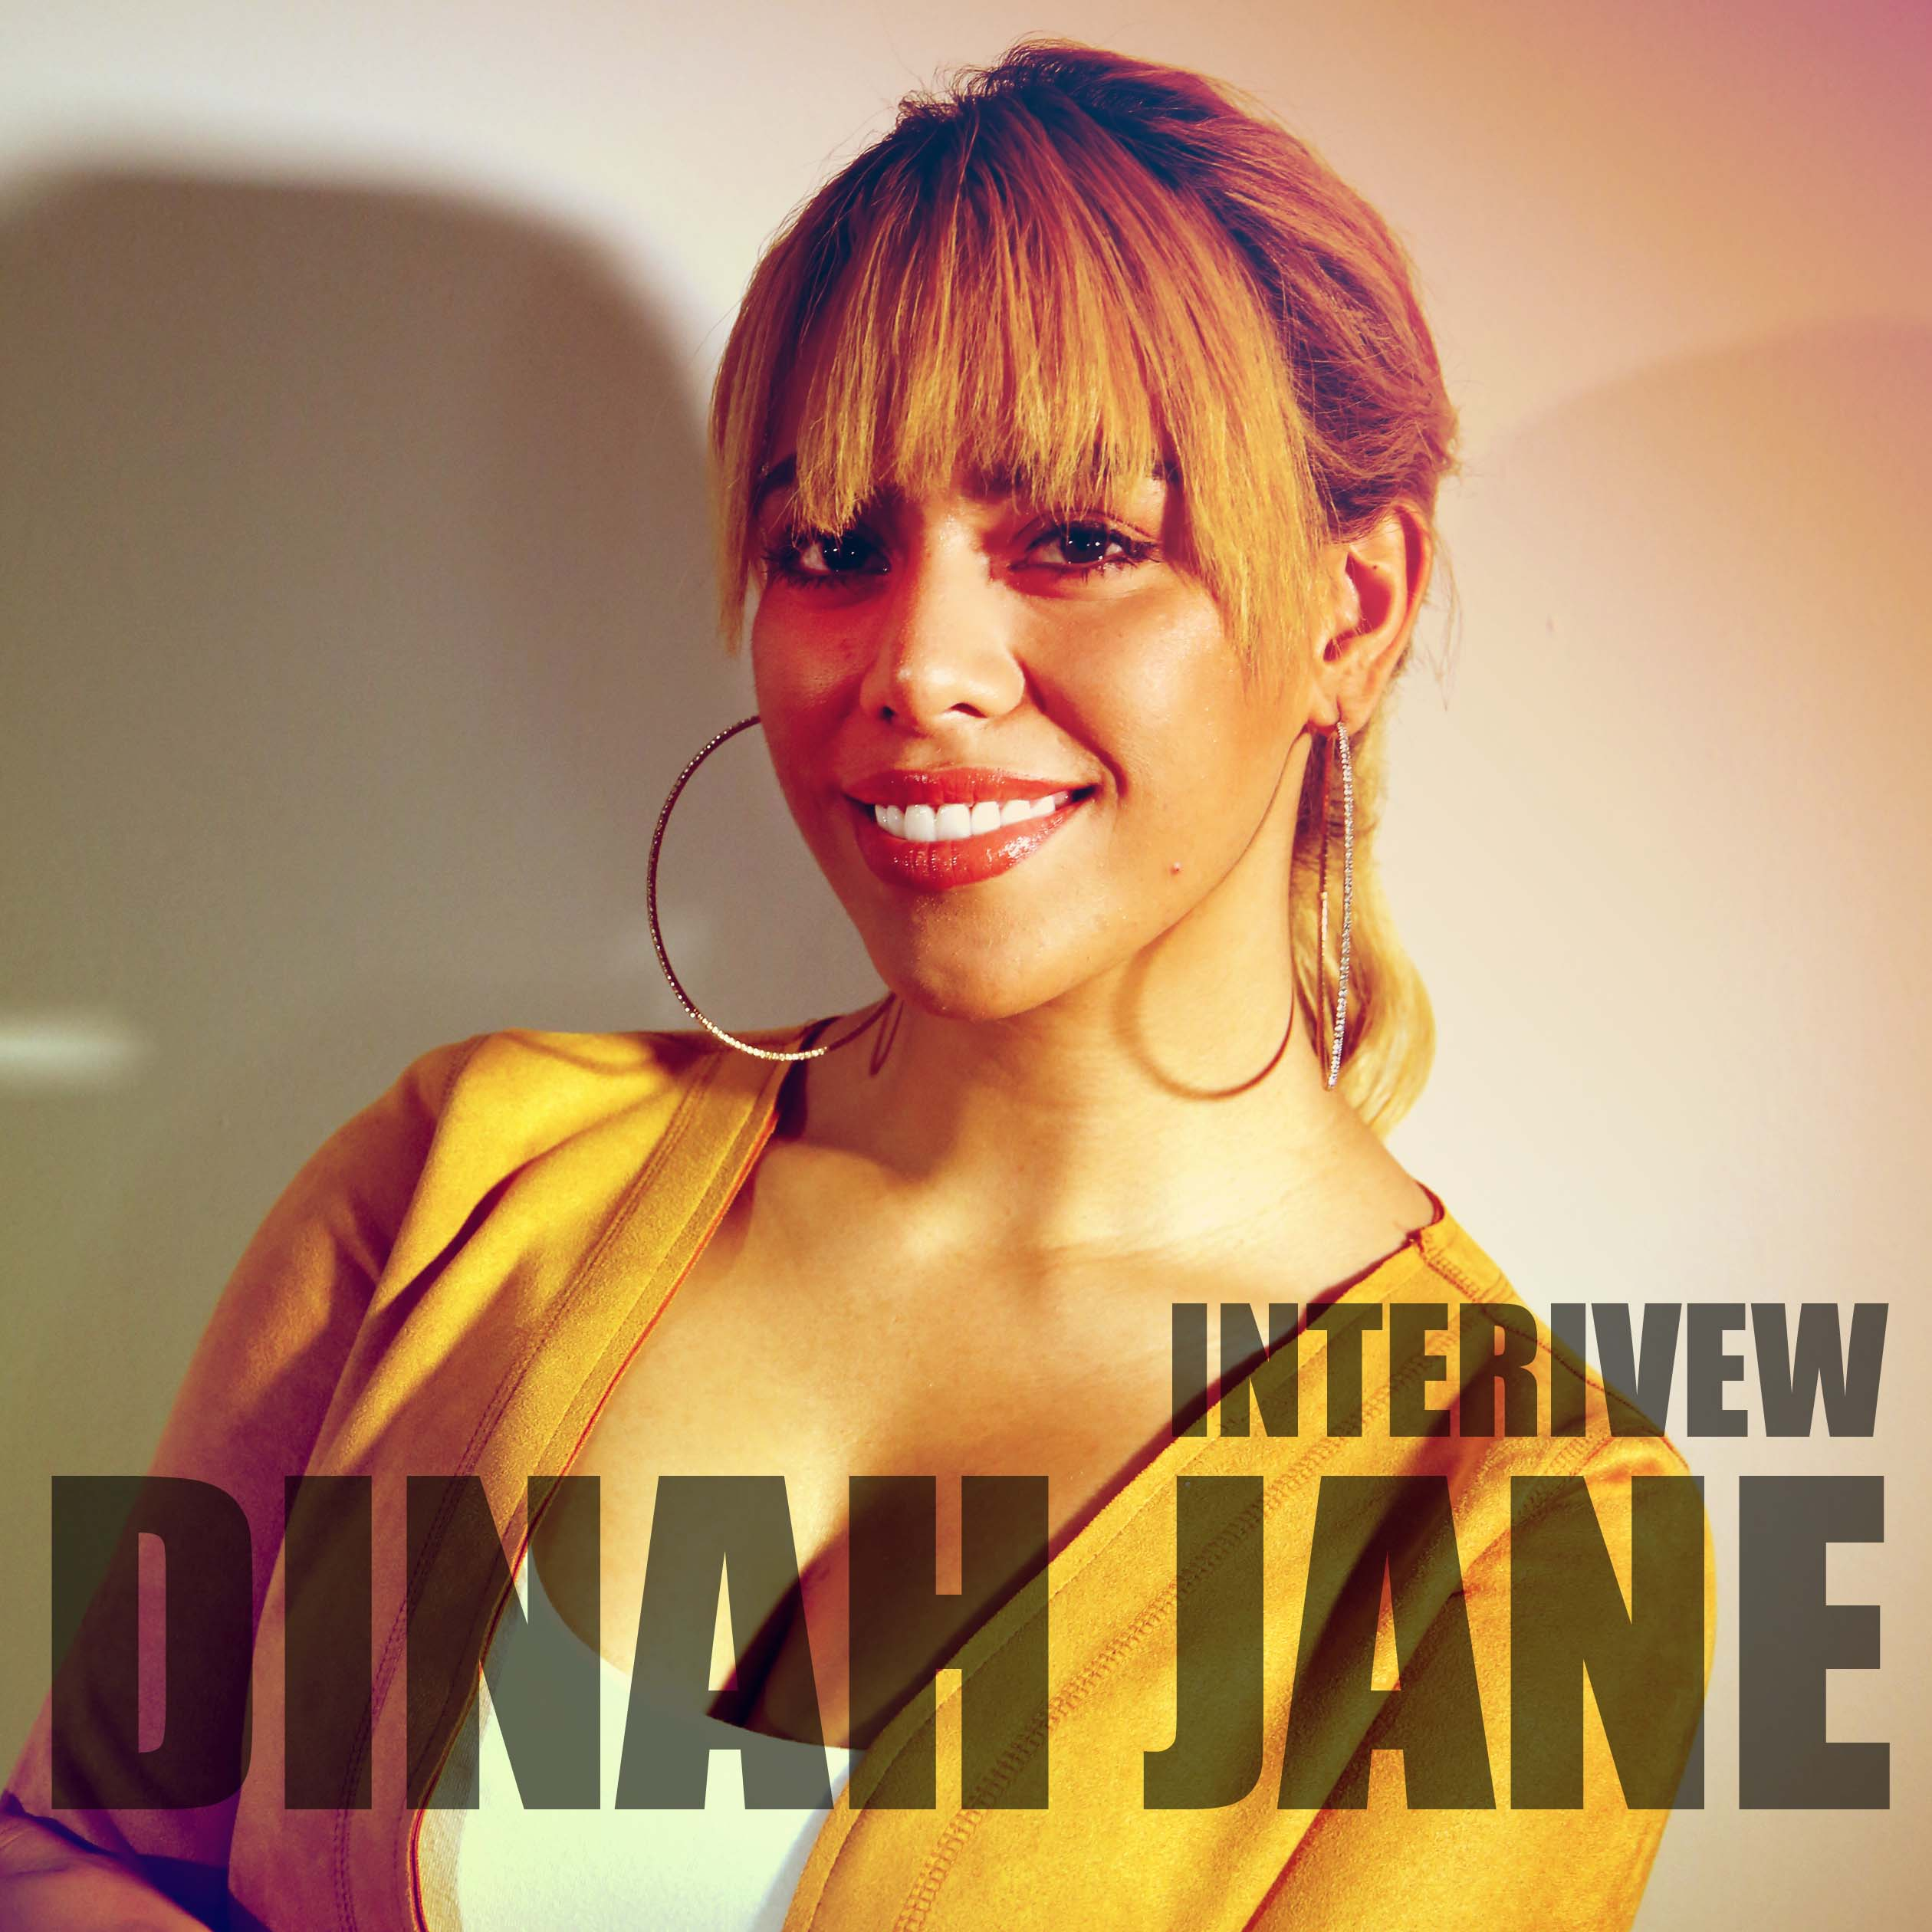 Dinah Jane – FULL VIDEO INTERVIEW & Meet and Greet Pics